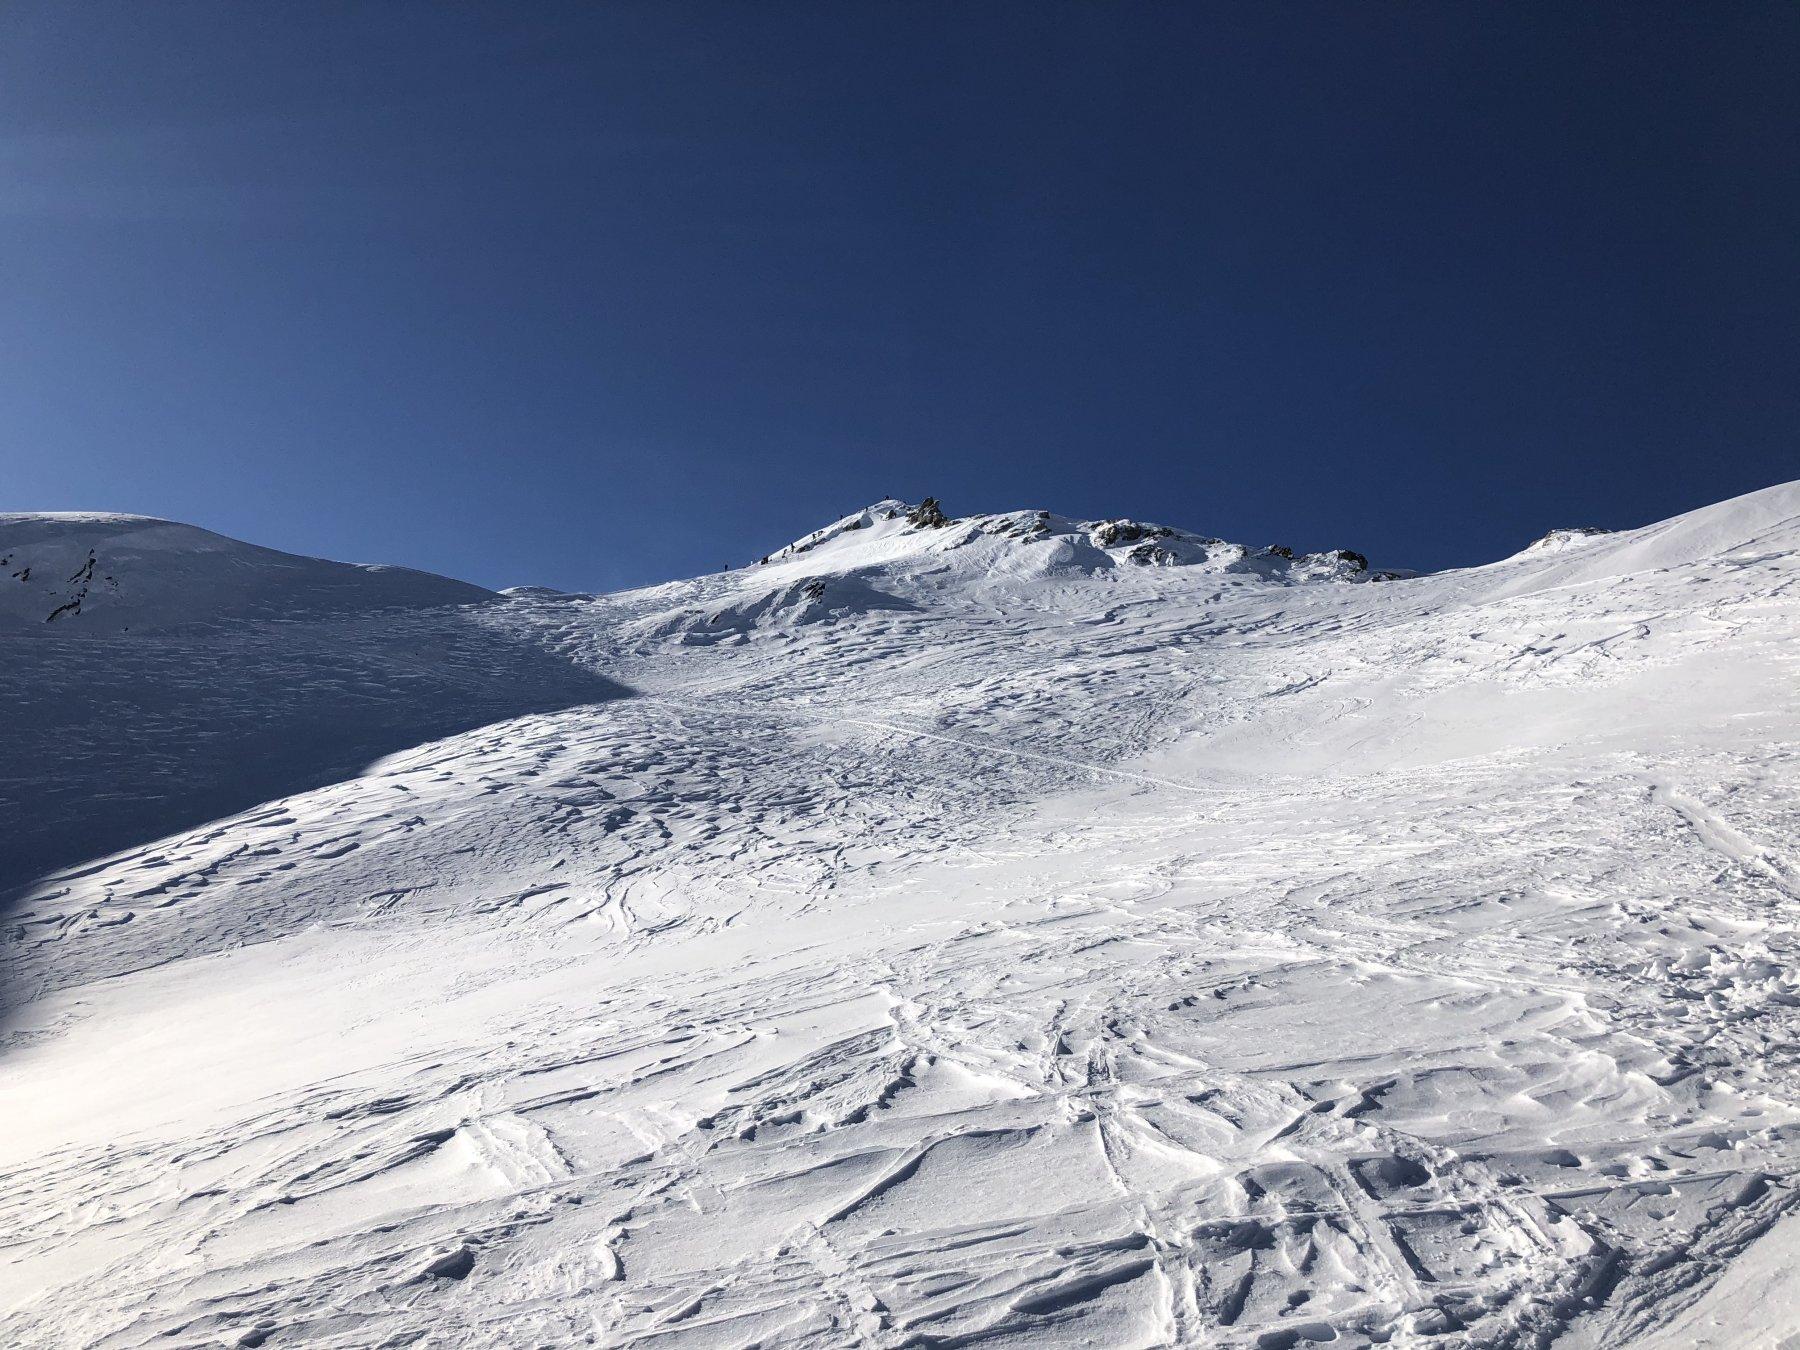 Fourchon (Mont) da Saint Rhemy 2020-01-05